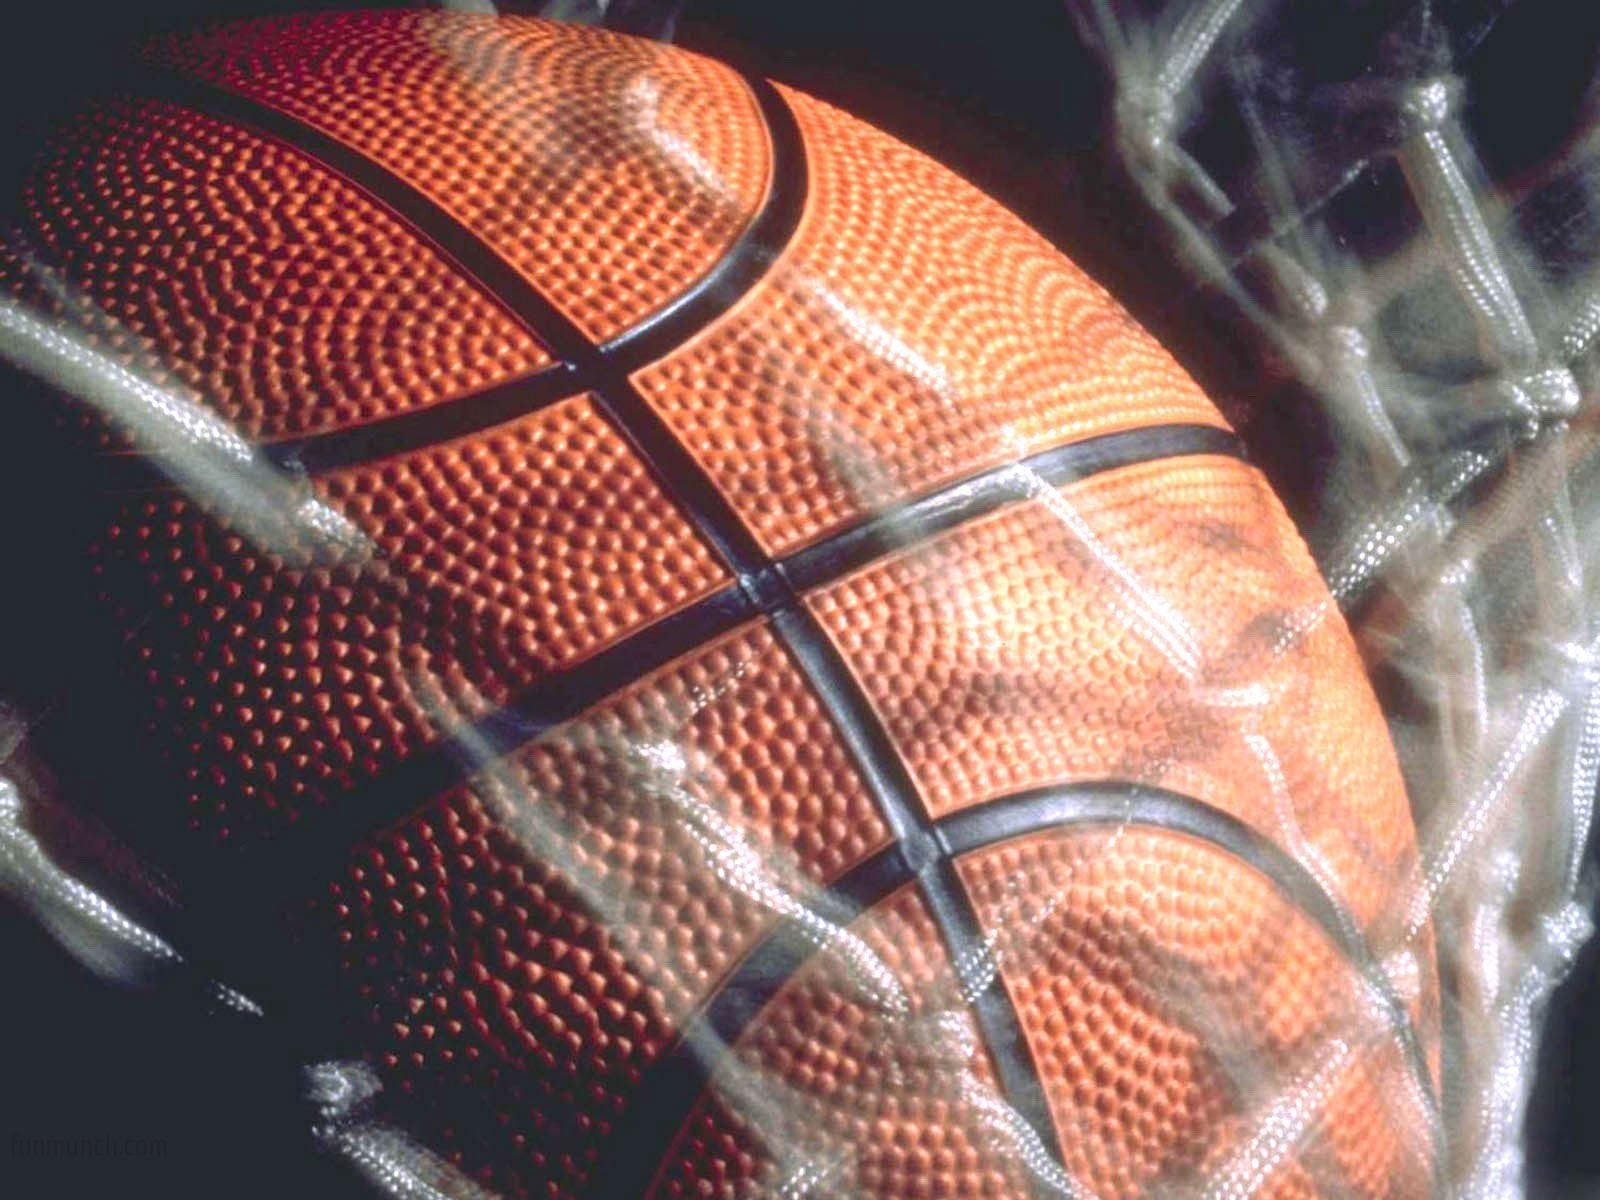 Fondos de baloncesto Wallpapers de baloncesto 1600x1200